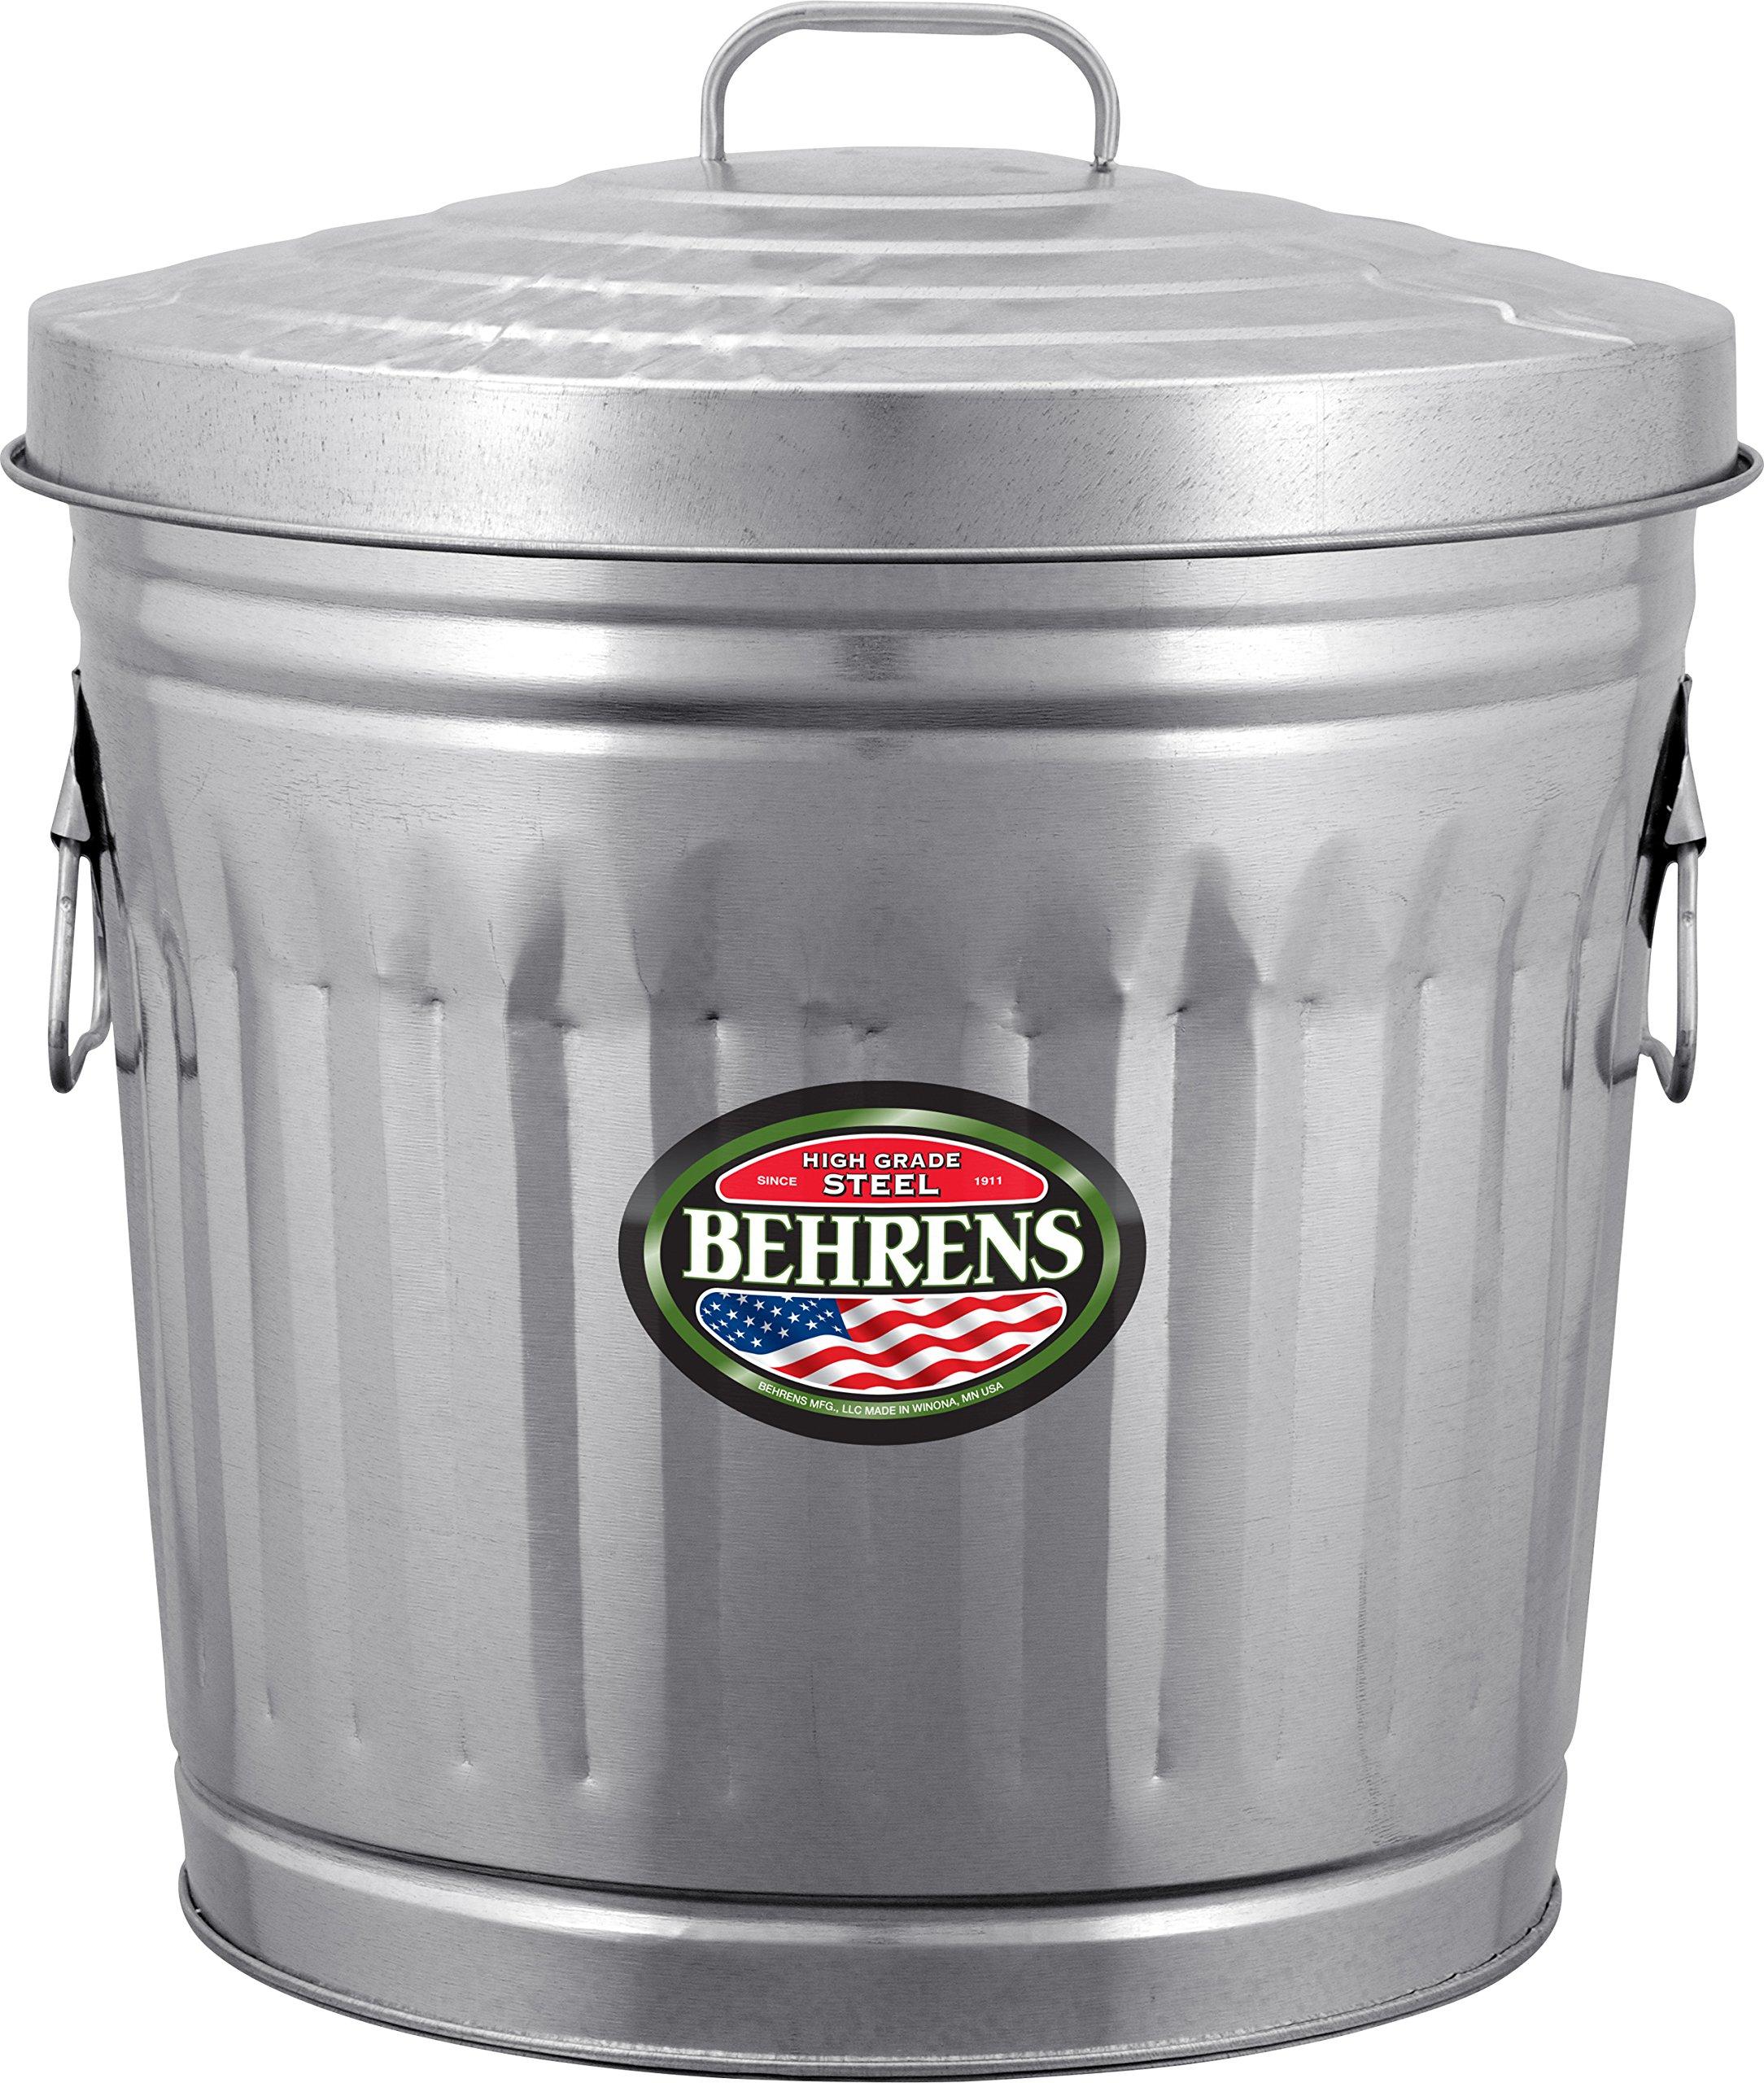 Behrens Manufacturing 6210 Galvanized Steel Trash Can, 10 gal